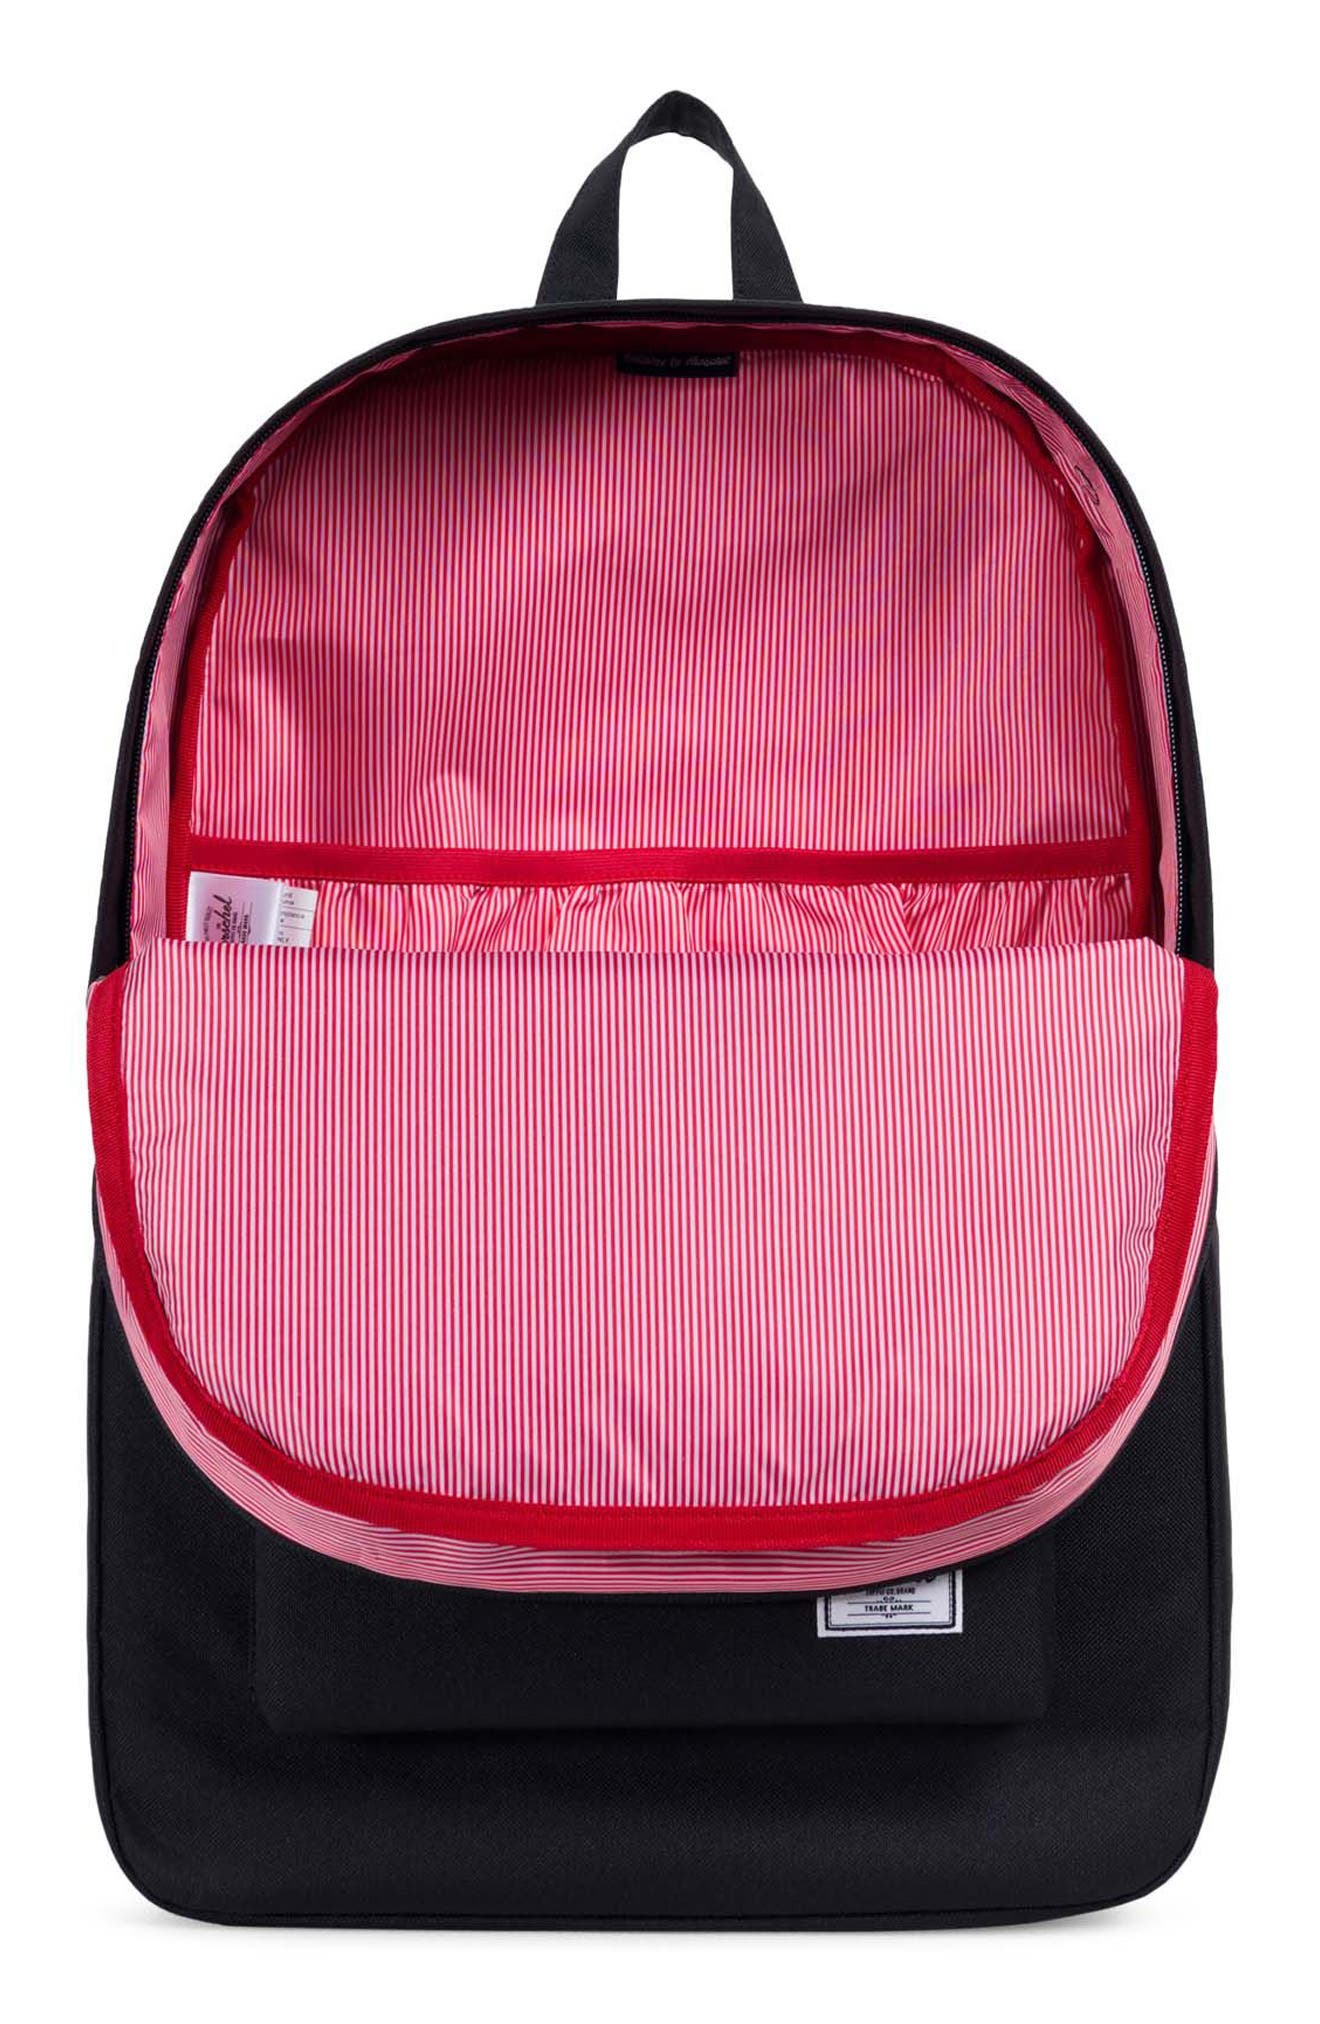 Heritage Reflective Backpack,                             Alternate thumbnail 3, color,                             Black/ Woodland Camo